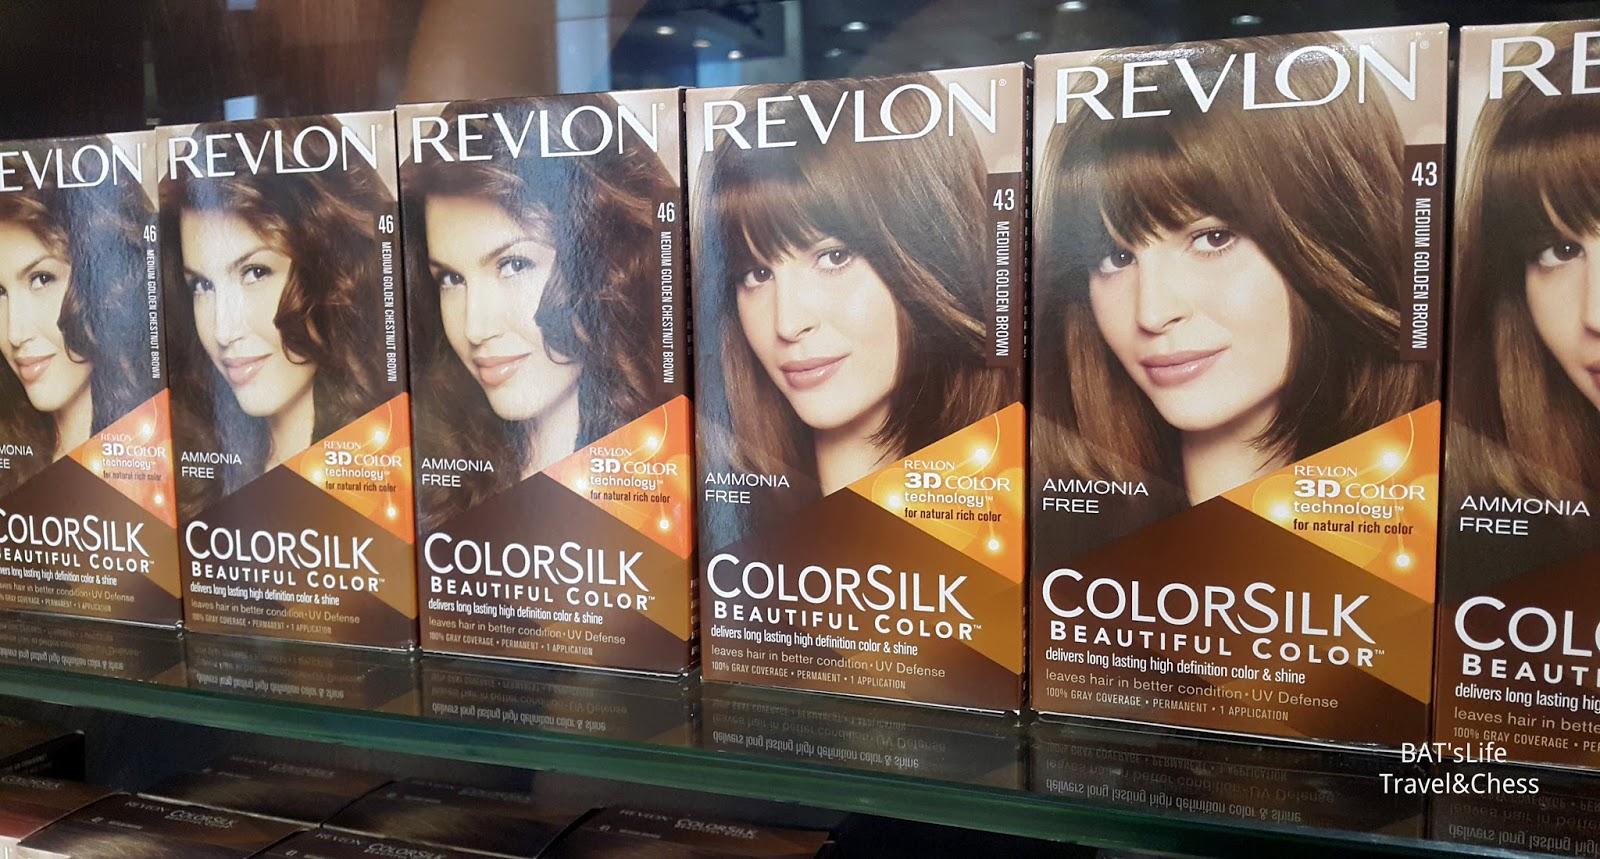 Batslife Revlons Free Hair Color Application